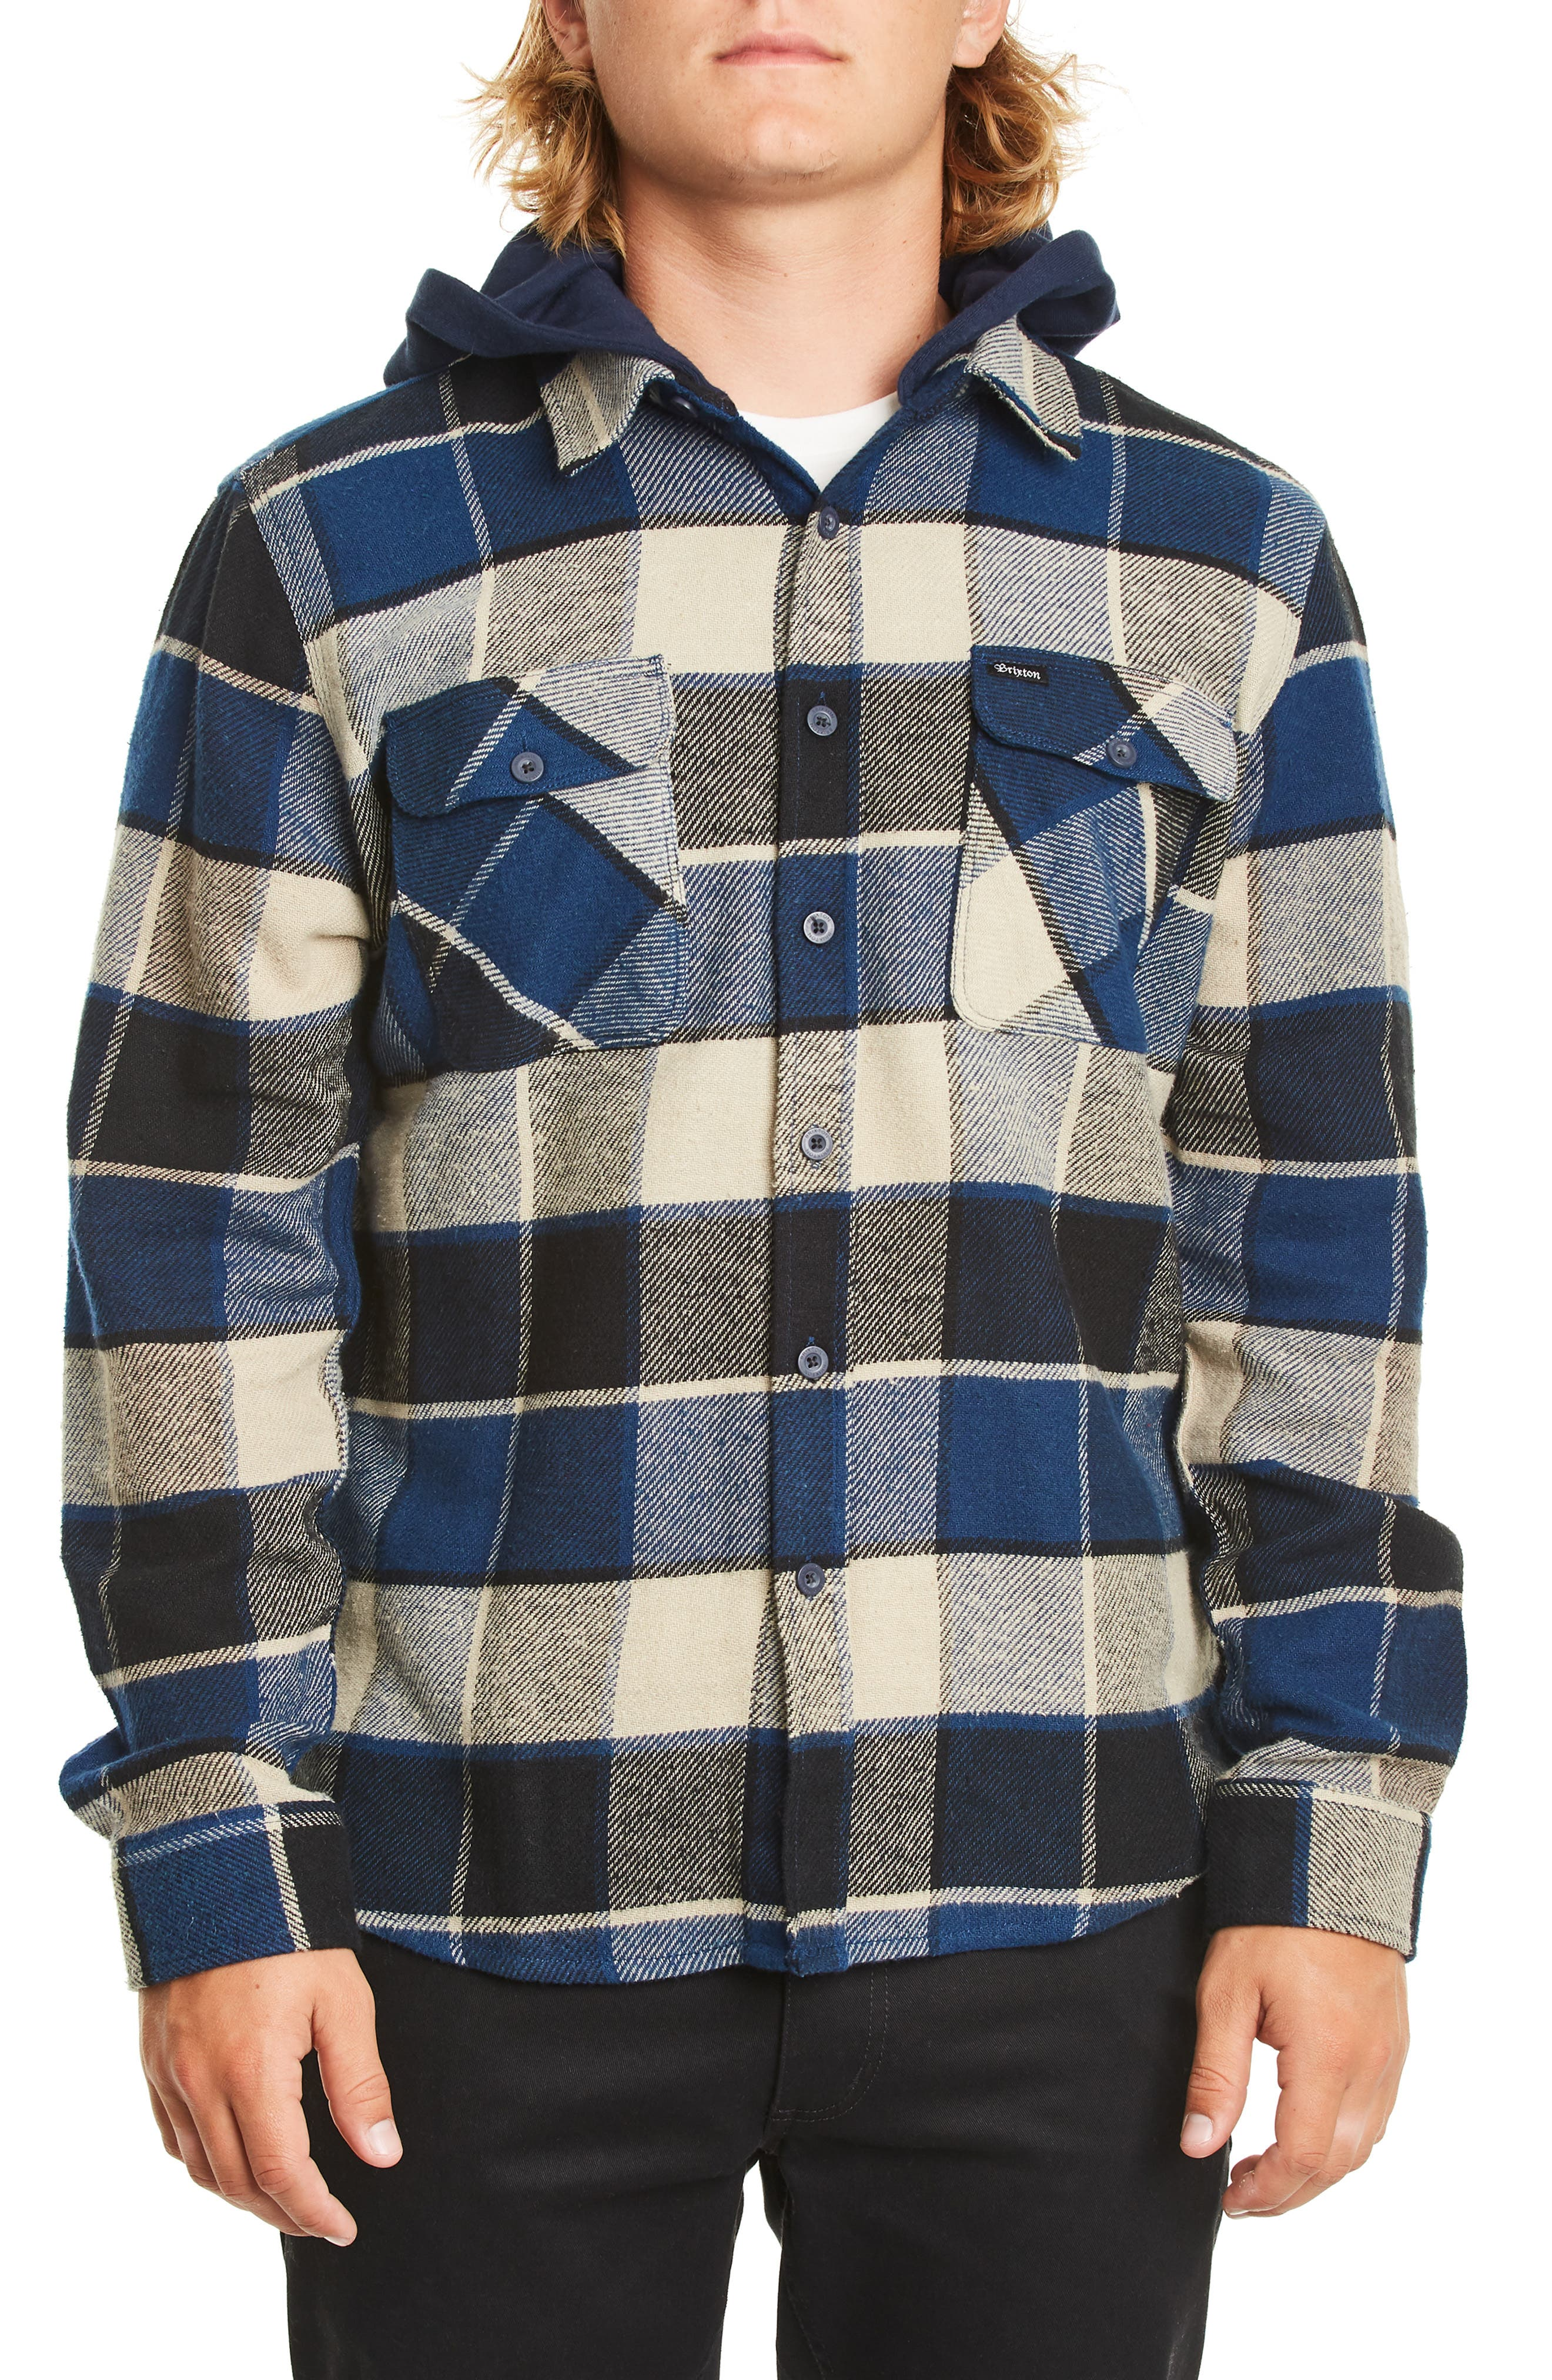 Brixton Bowery Plaid Flannel Shirt With Hood, Black